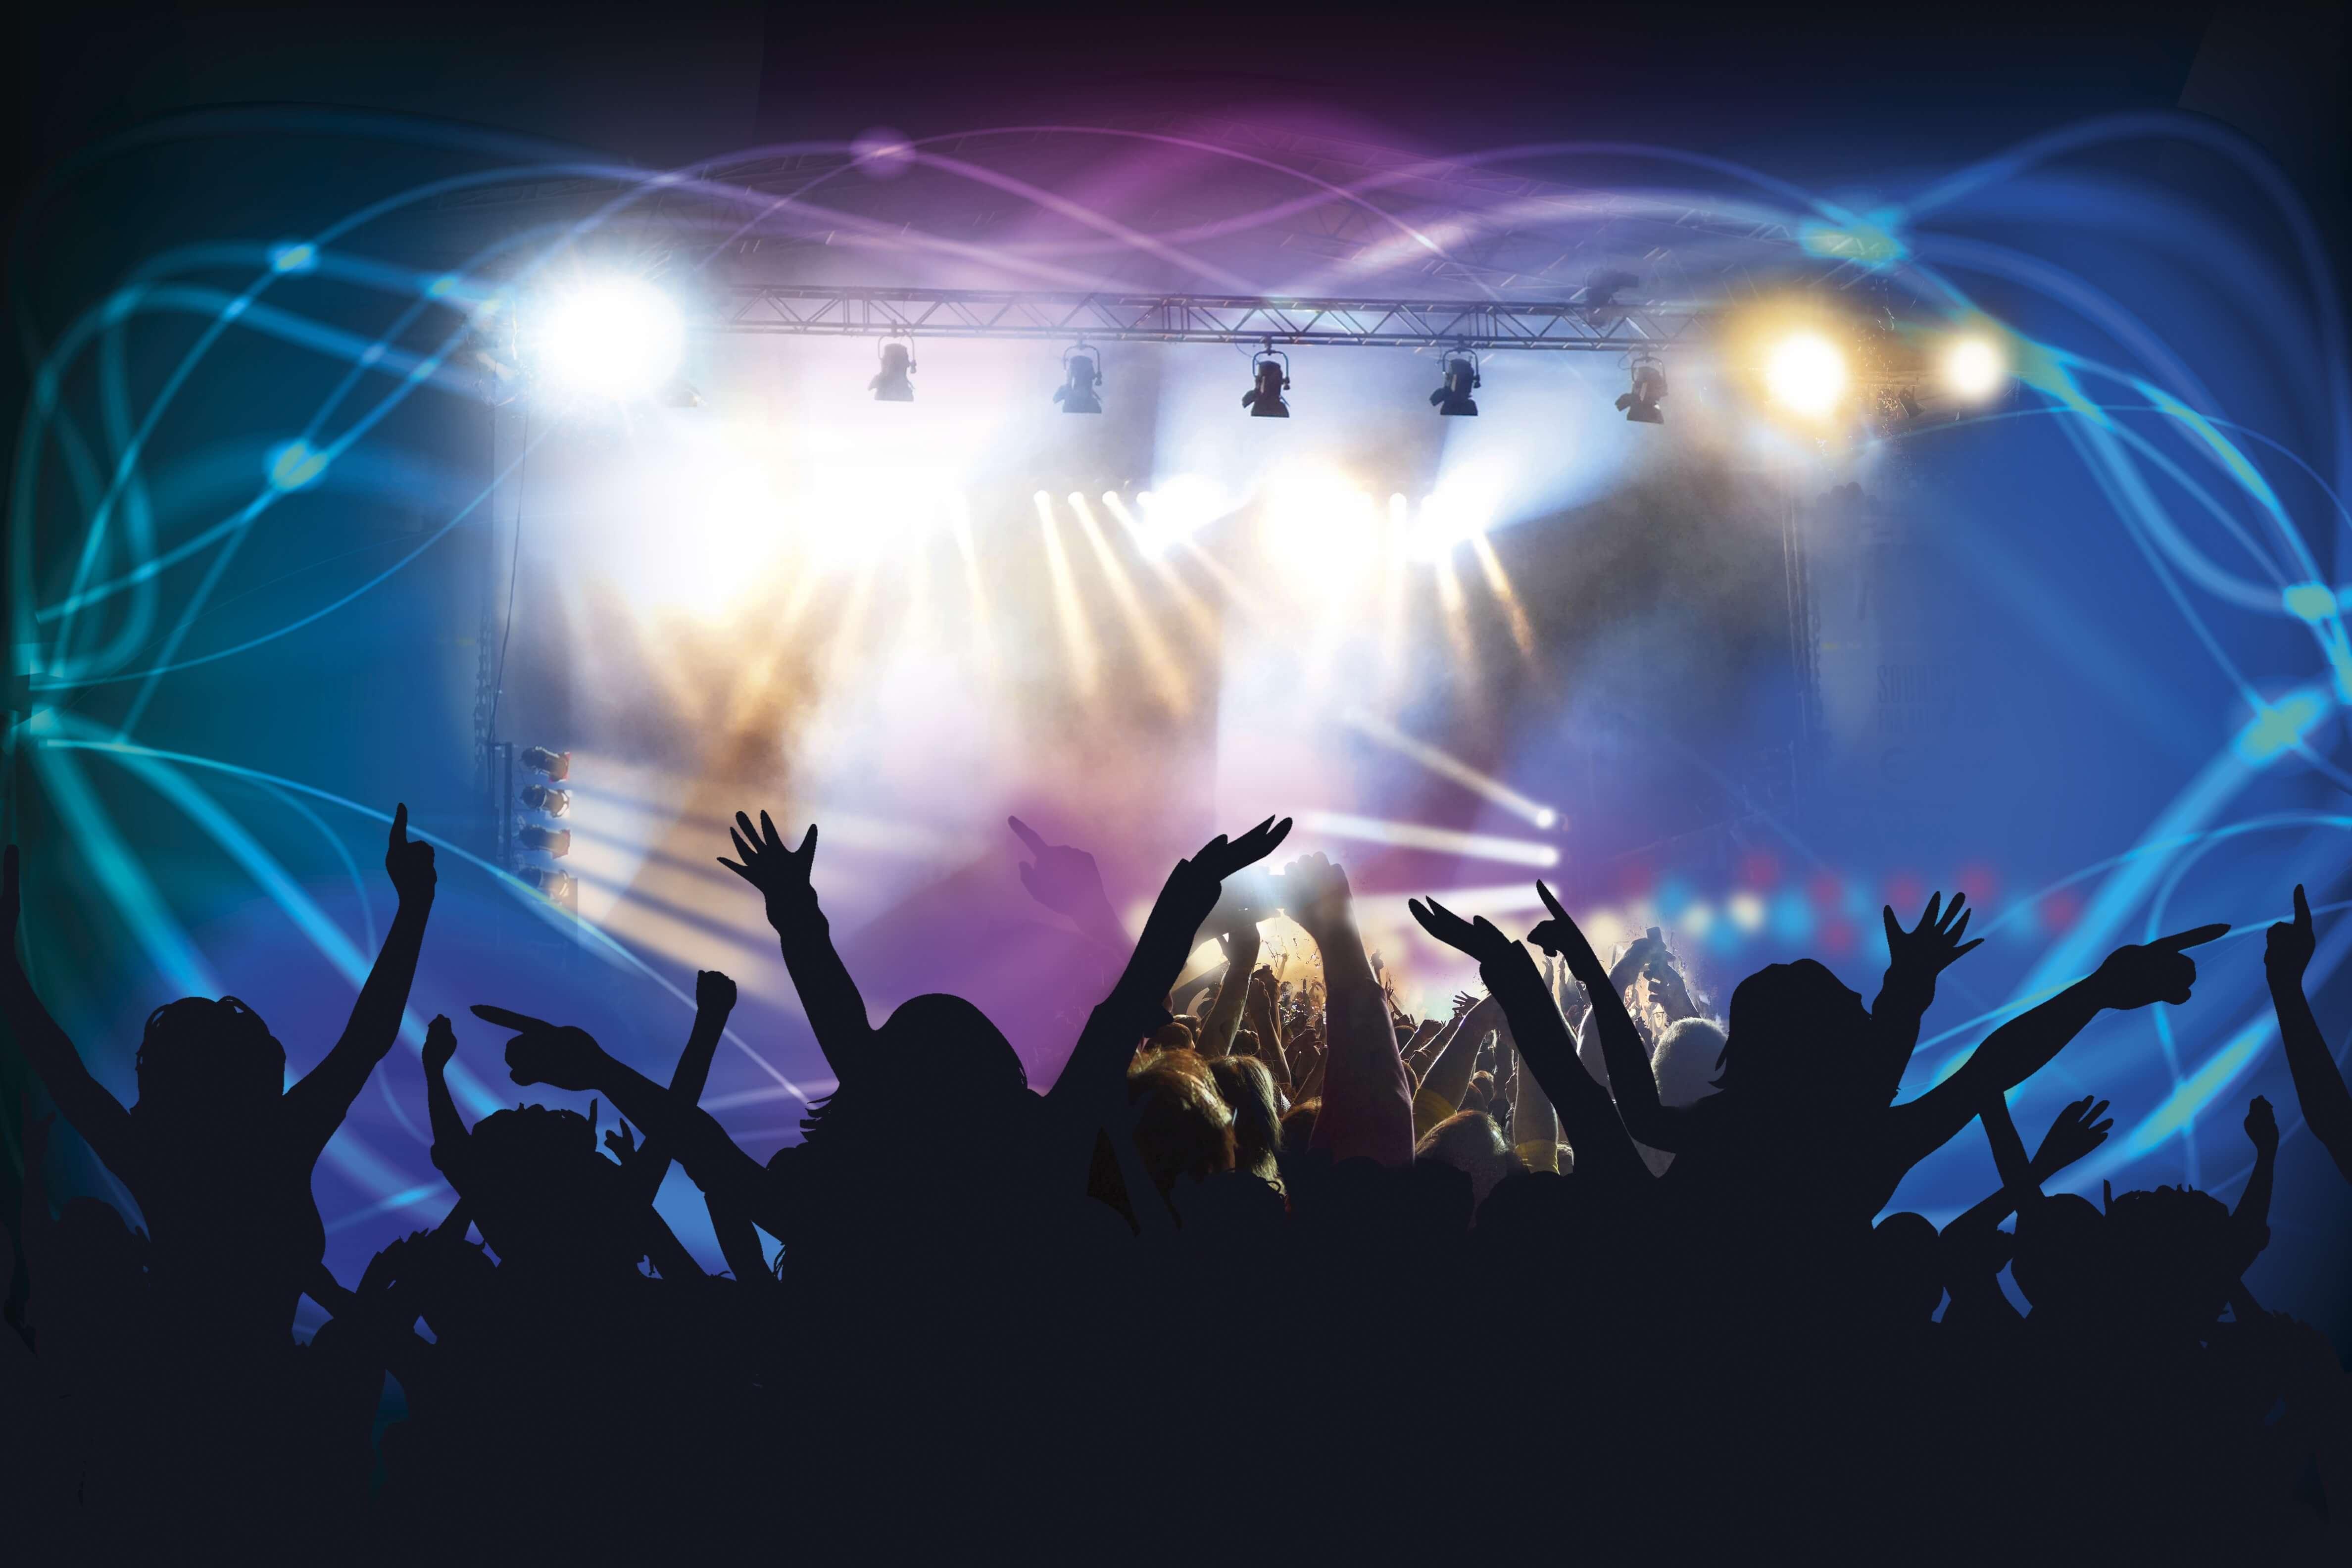 festivales de música en europa en interrail en verano